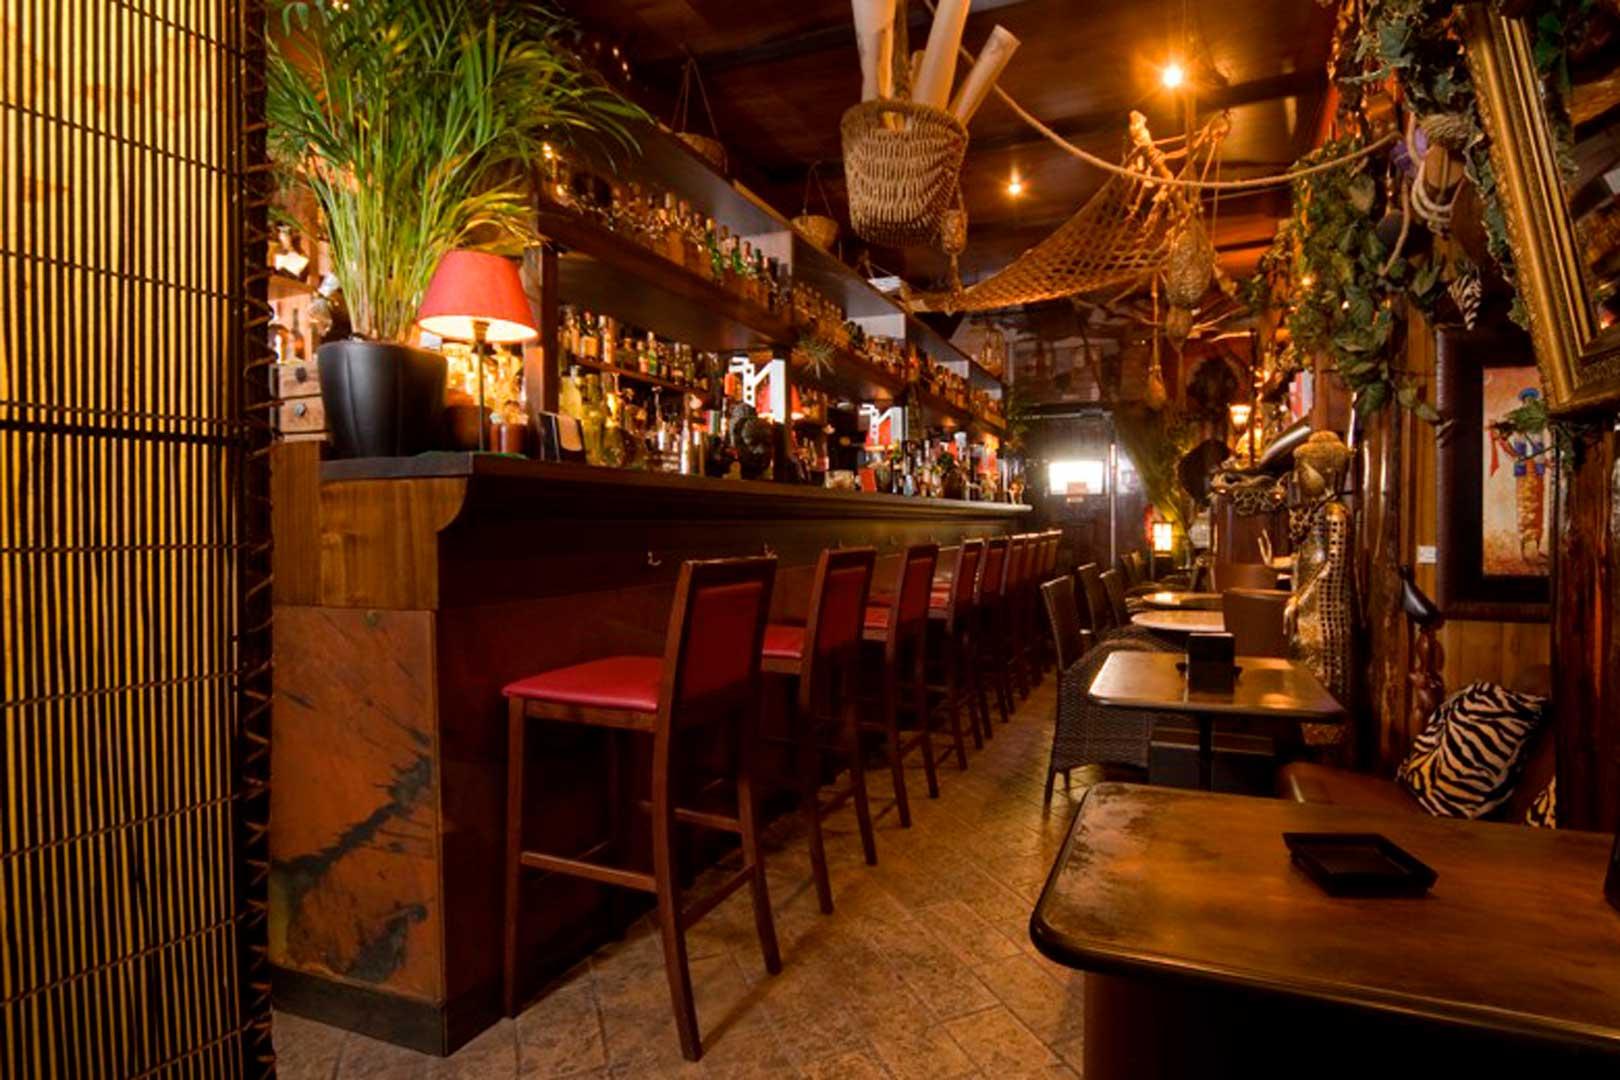 I migliori cocktail bar a tema di Milano - Nottingham Forest